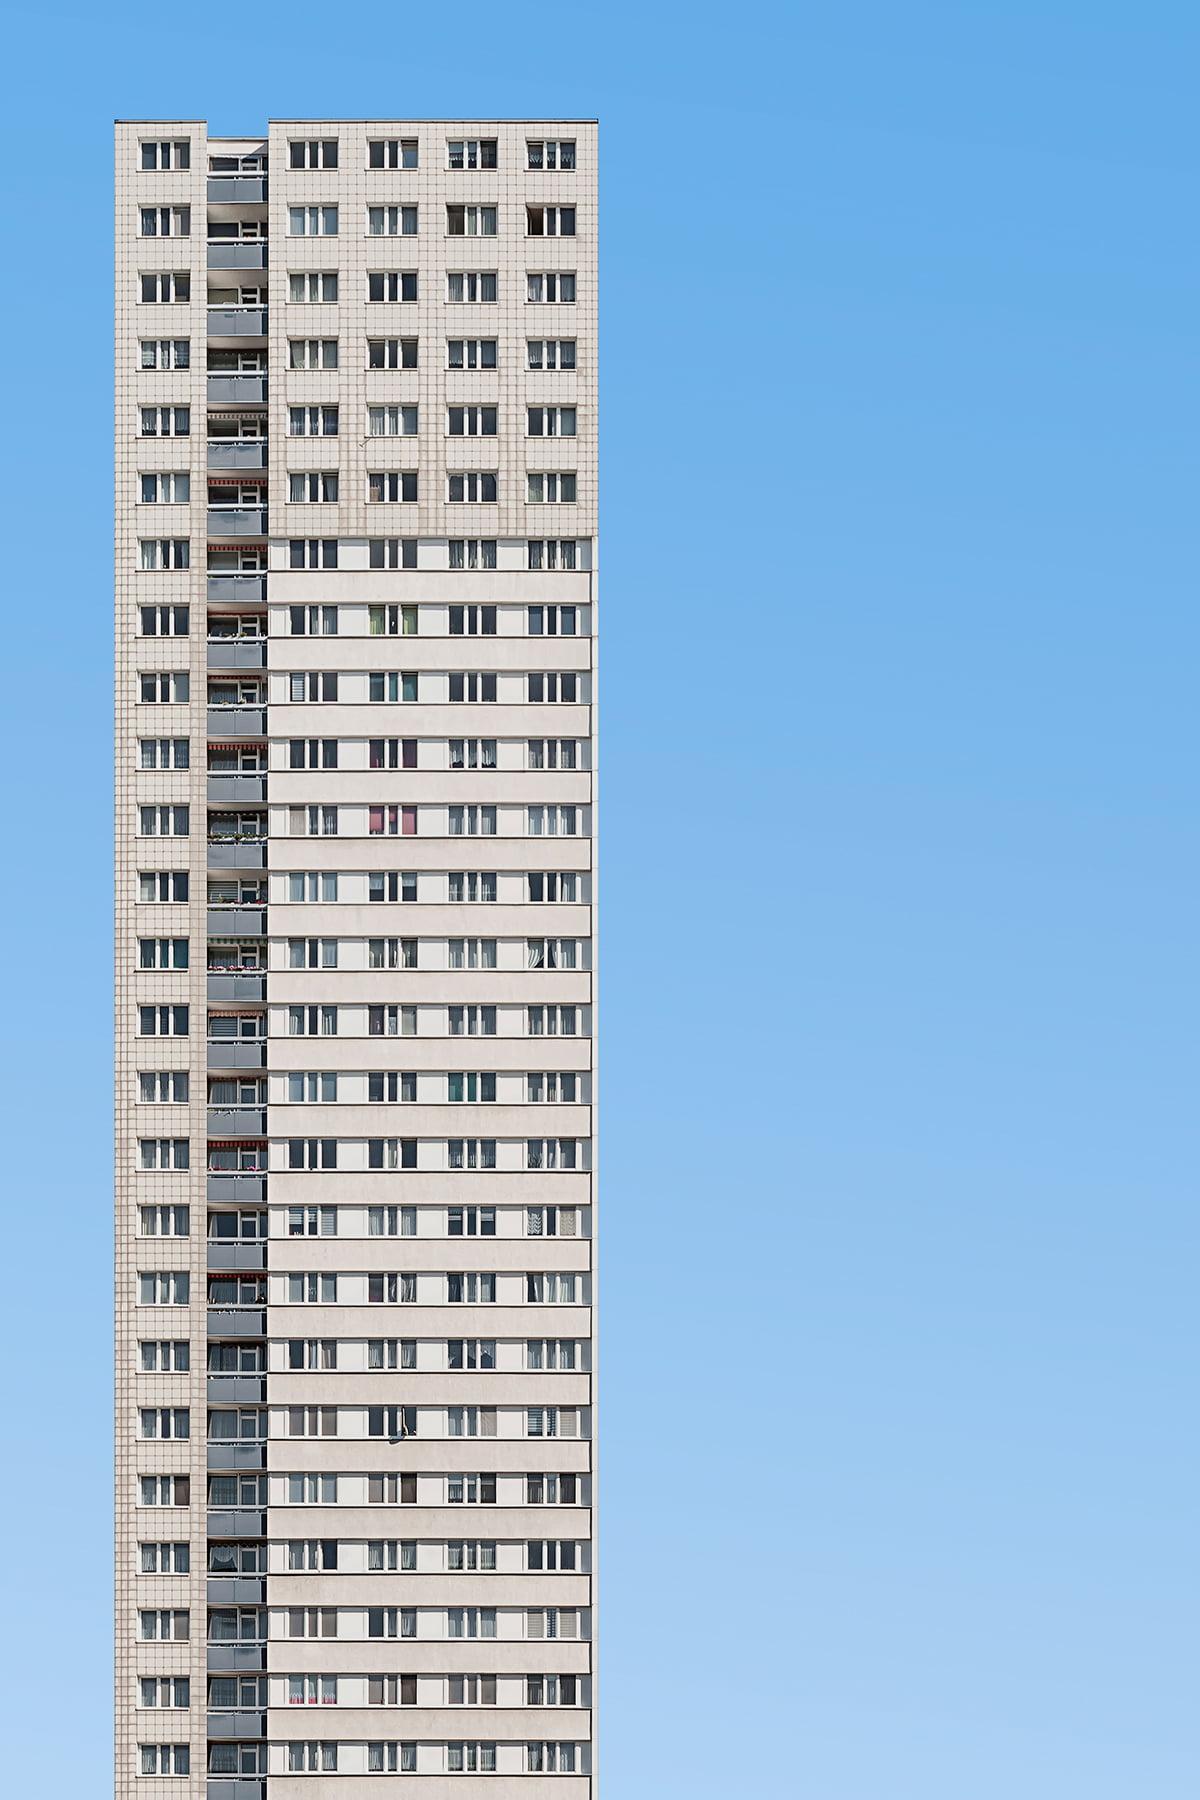 Lorenzo_Linthout_Vertical buildings_04